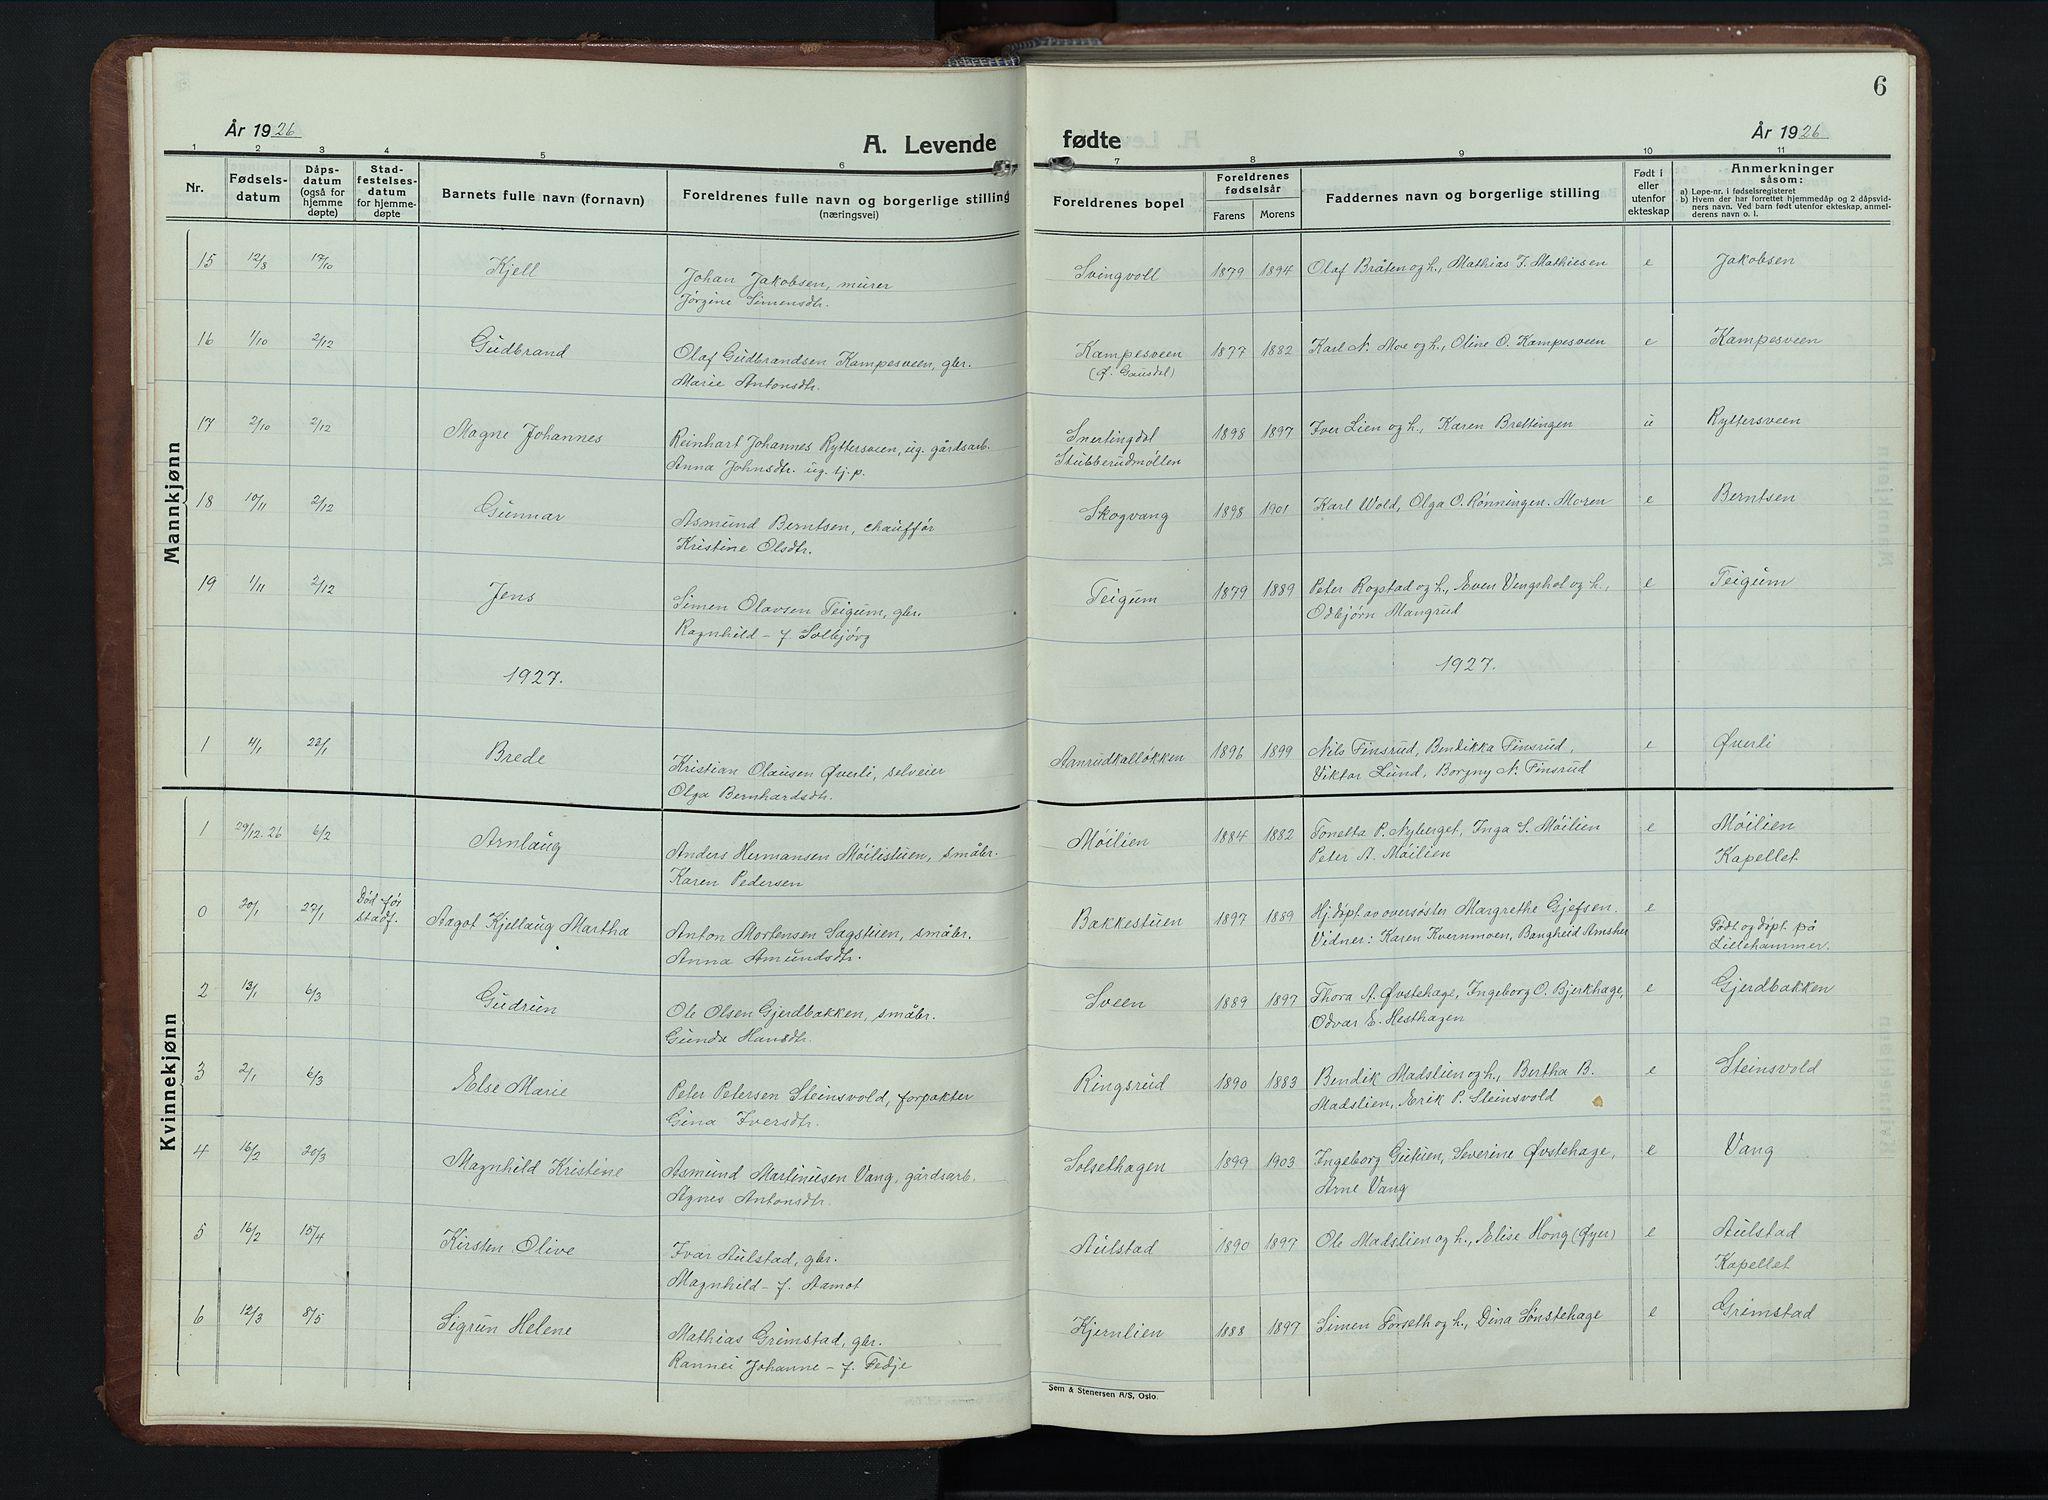 SAH, Vestre Gausdal prestekontor, Klokkerbok nr. 5, 1926-1955, s. 6